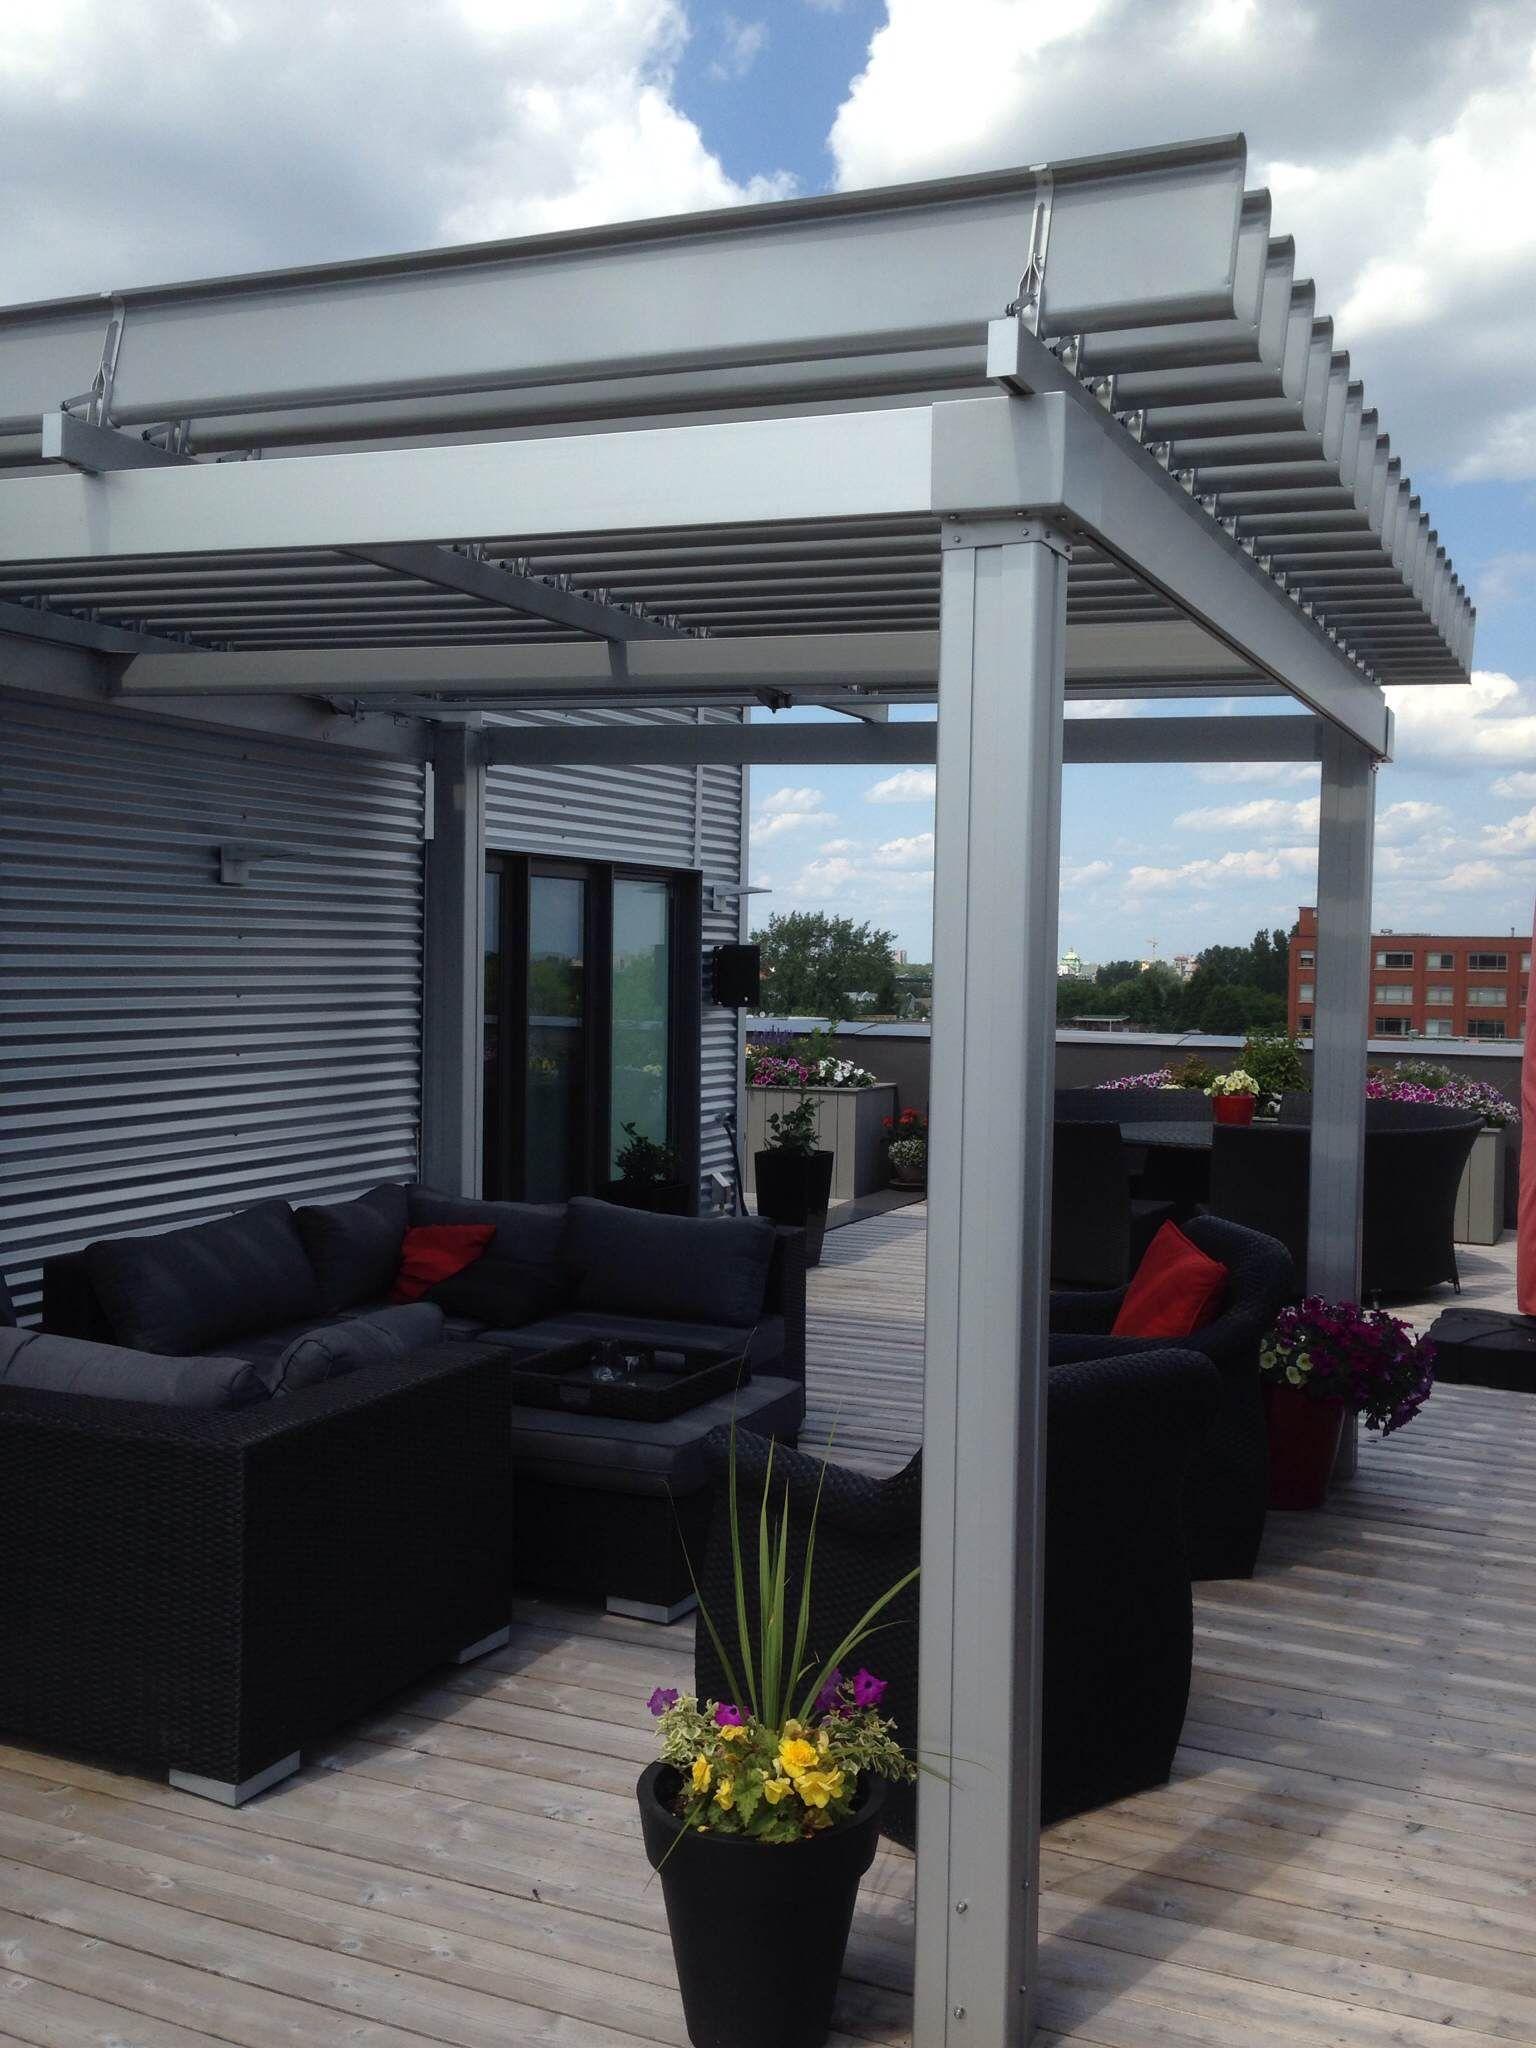 Magnifique Sunlouvre Pergolas Sur Toit-Terrasse #pergola ... serapportantà Toit Terrasse Aluminium